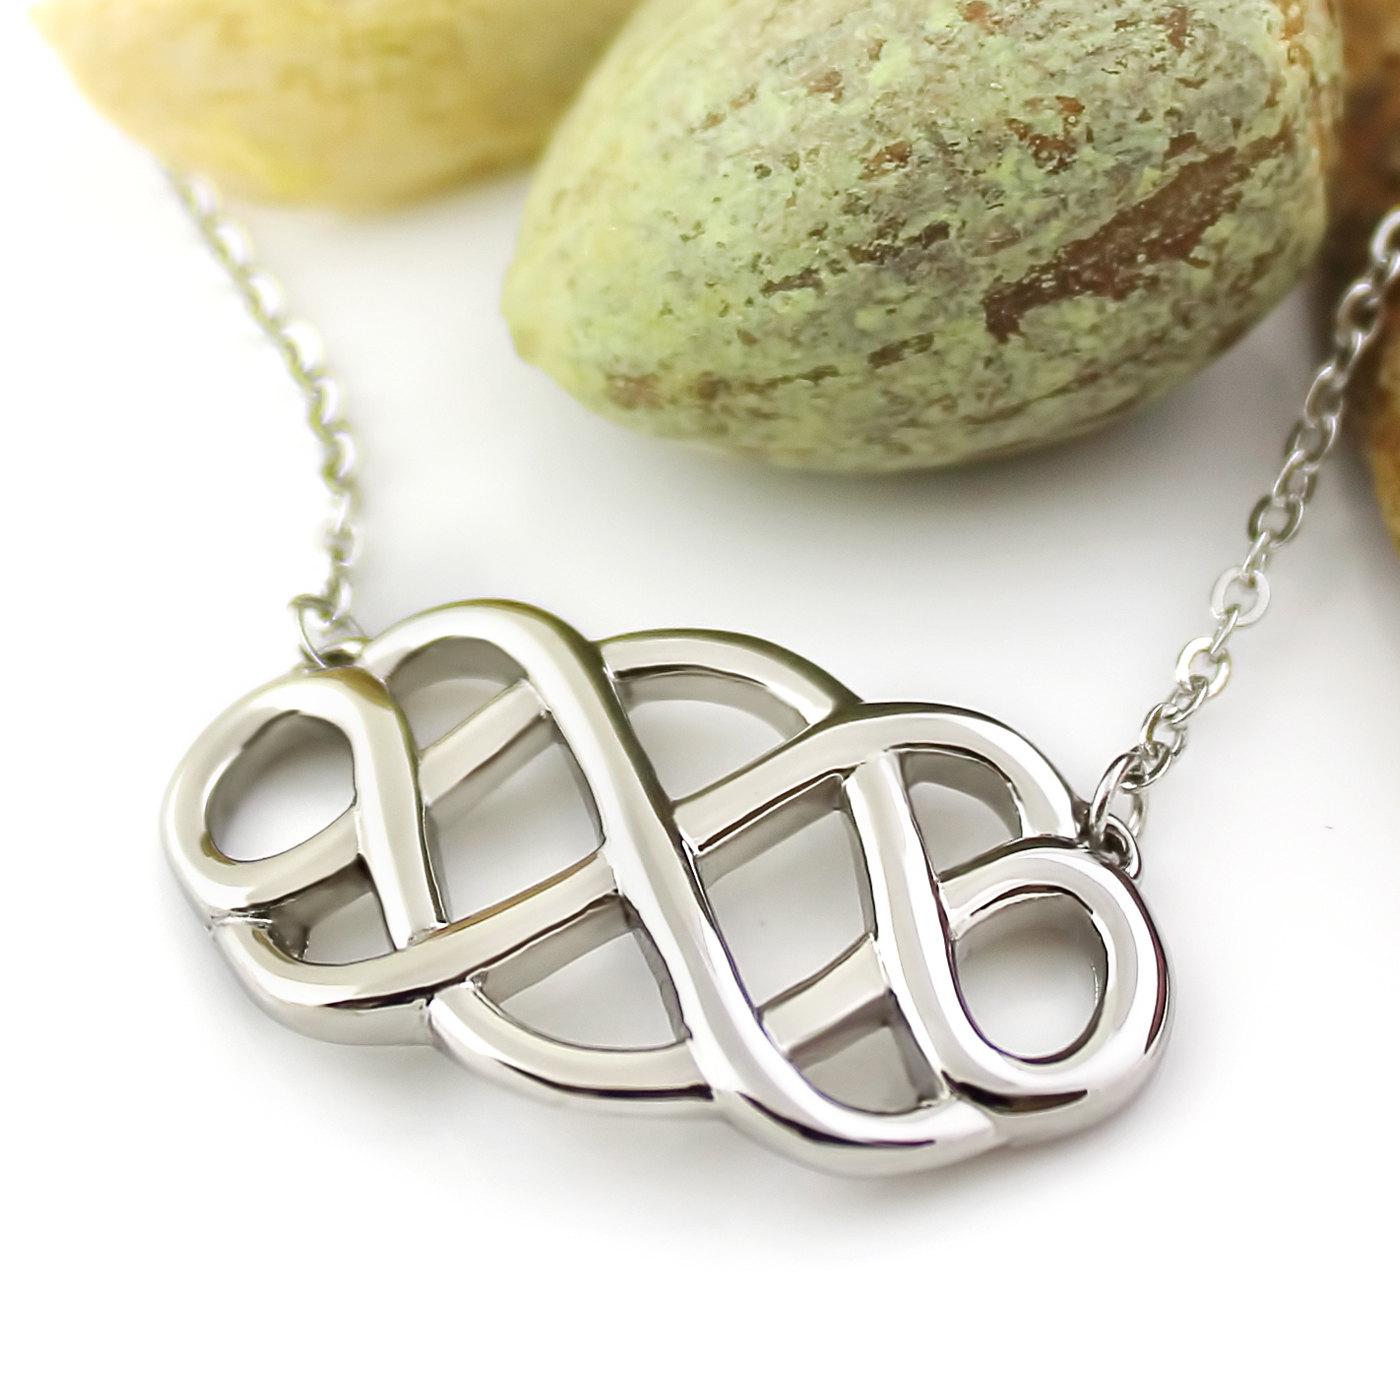 Medium Double Infinity Necklace Infinity Symbol Pendant Unisex